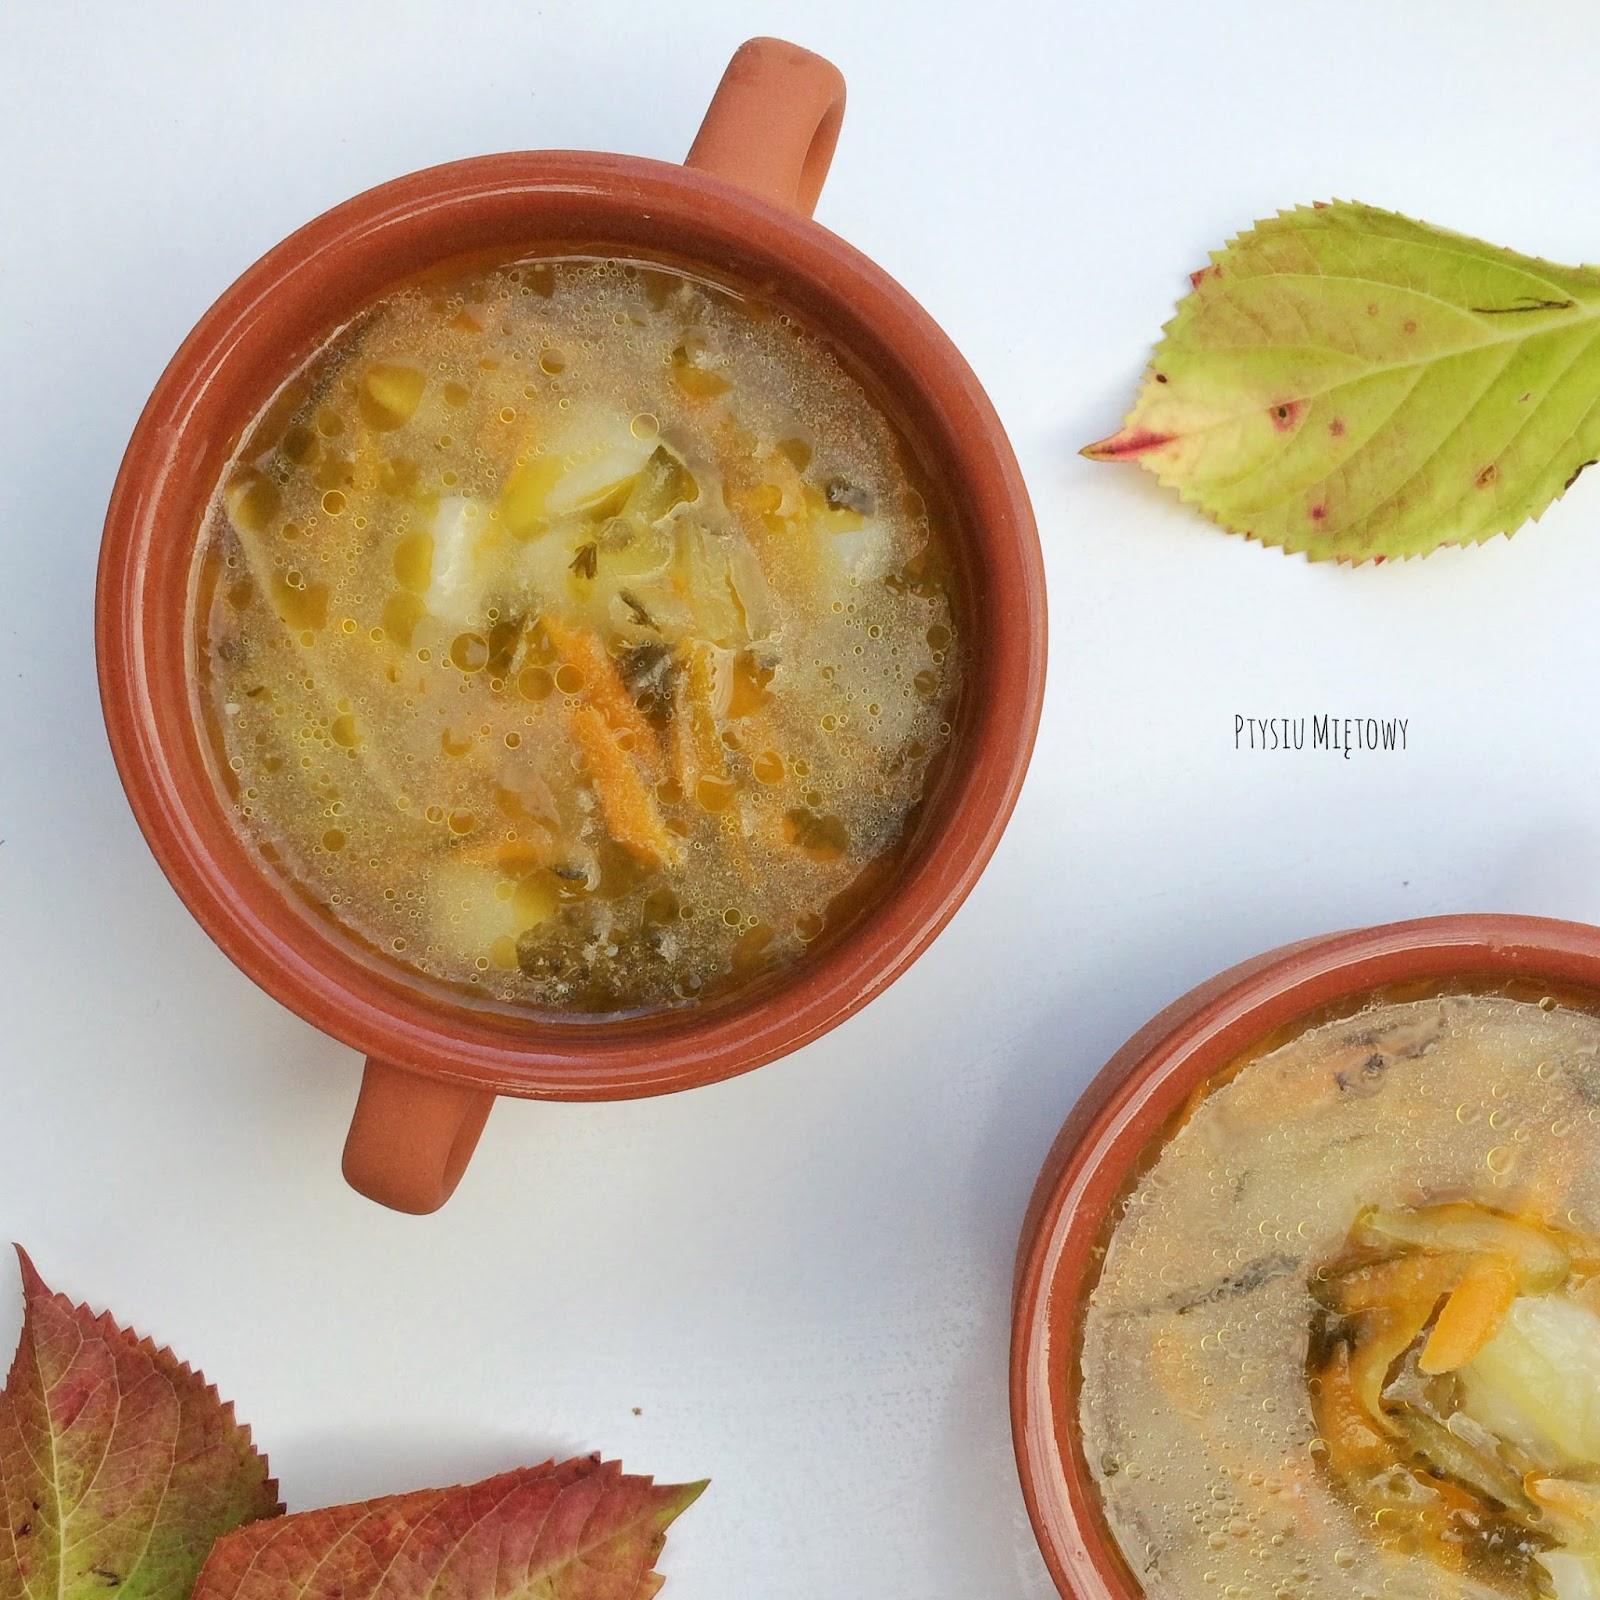 zupa, ptysiu mietowy